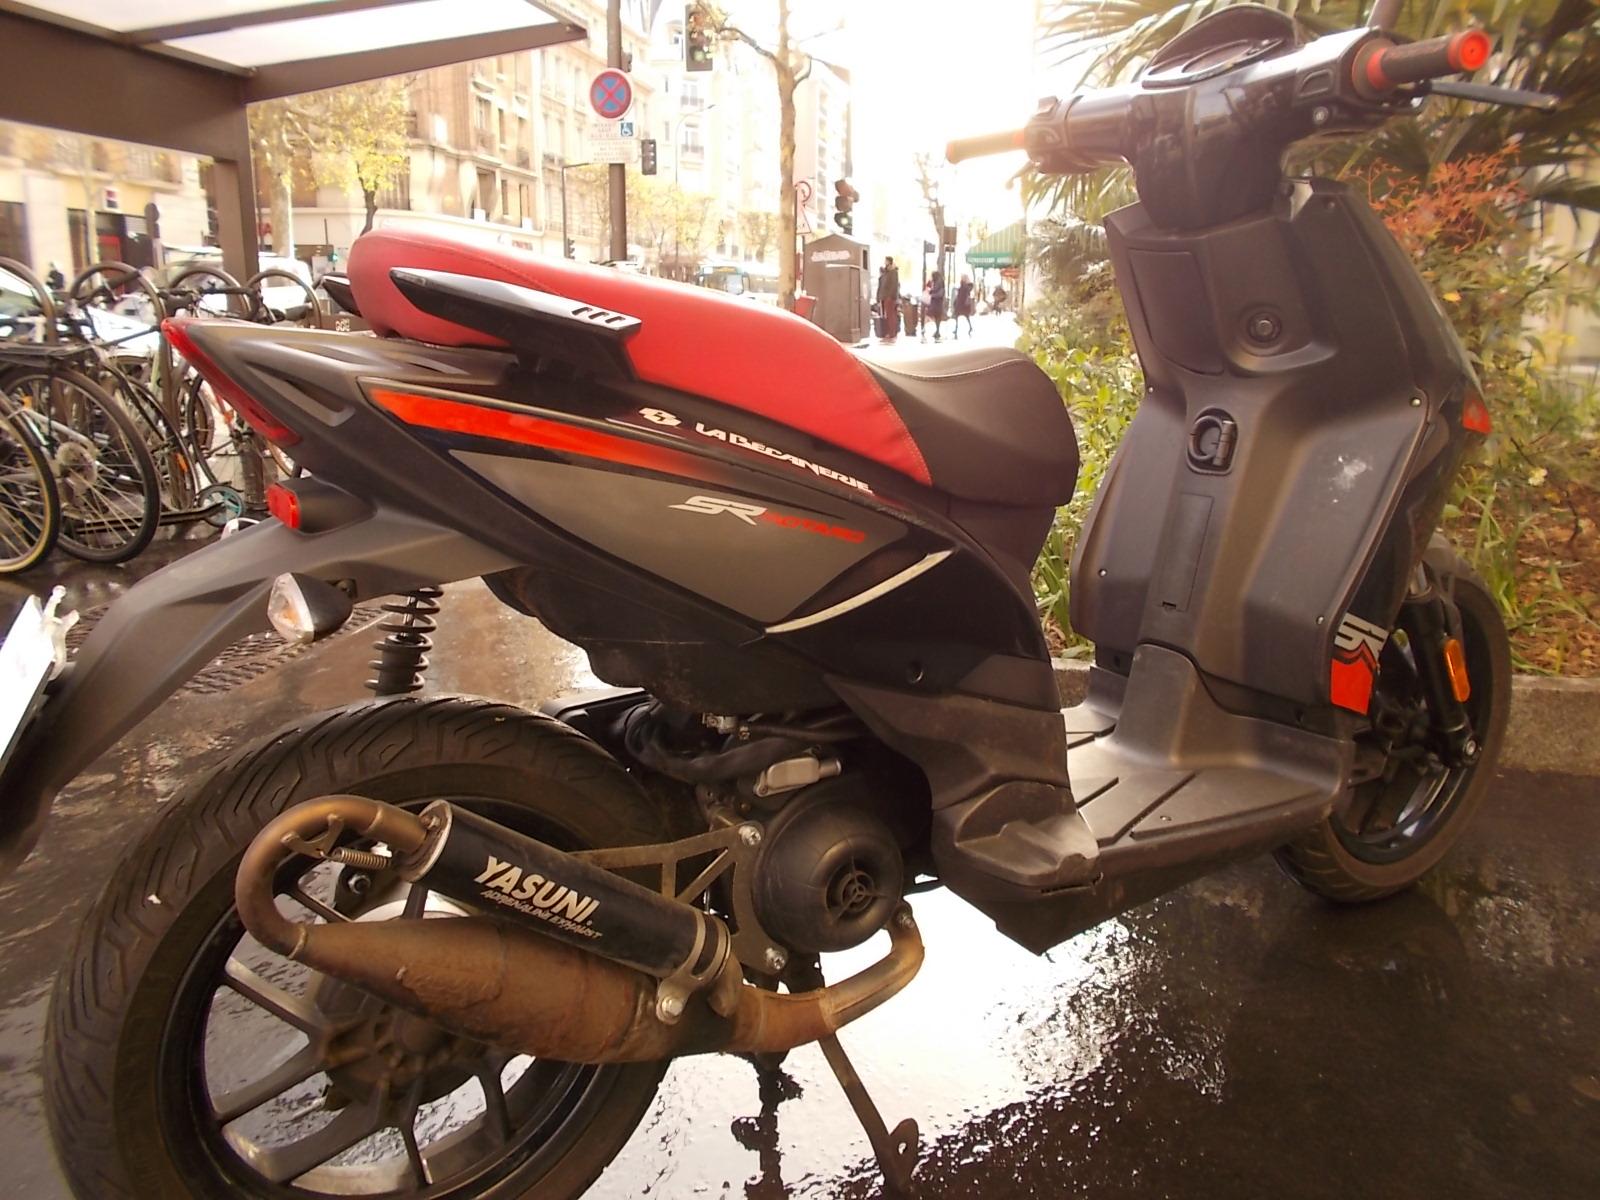 moto 50 cm3 occasion toulouse univers moto. Black Bedroom Furniture Sets. Home Design Ideas